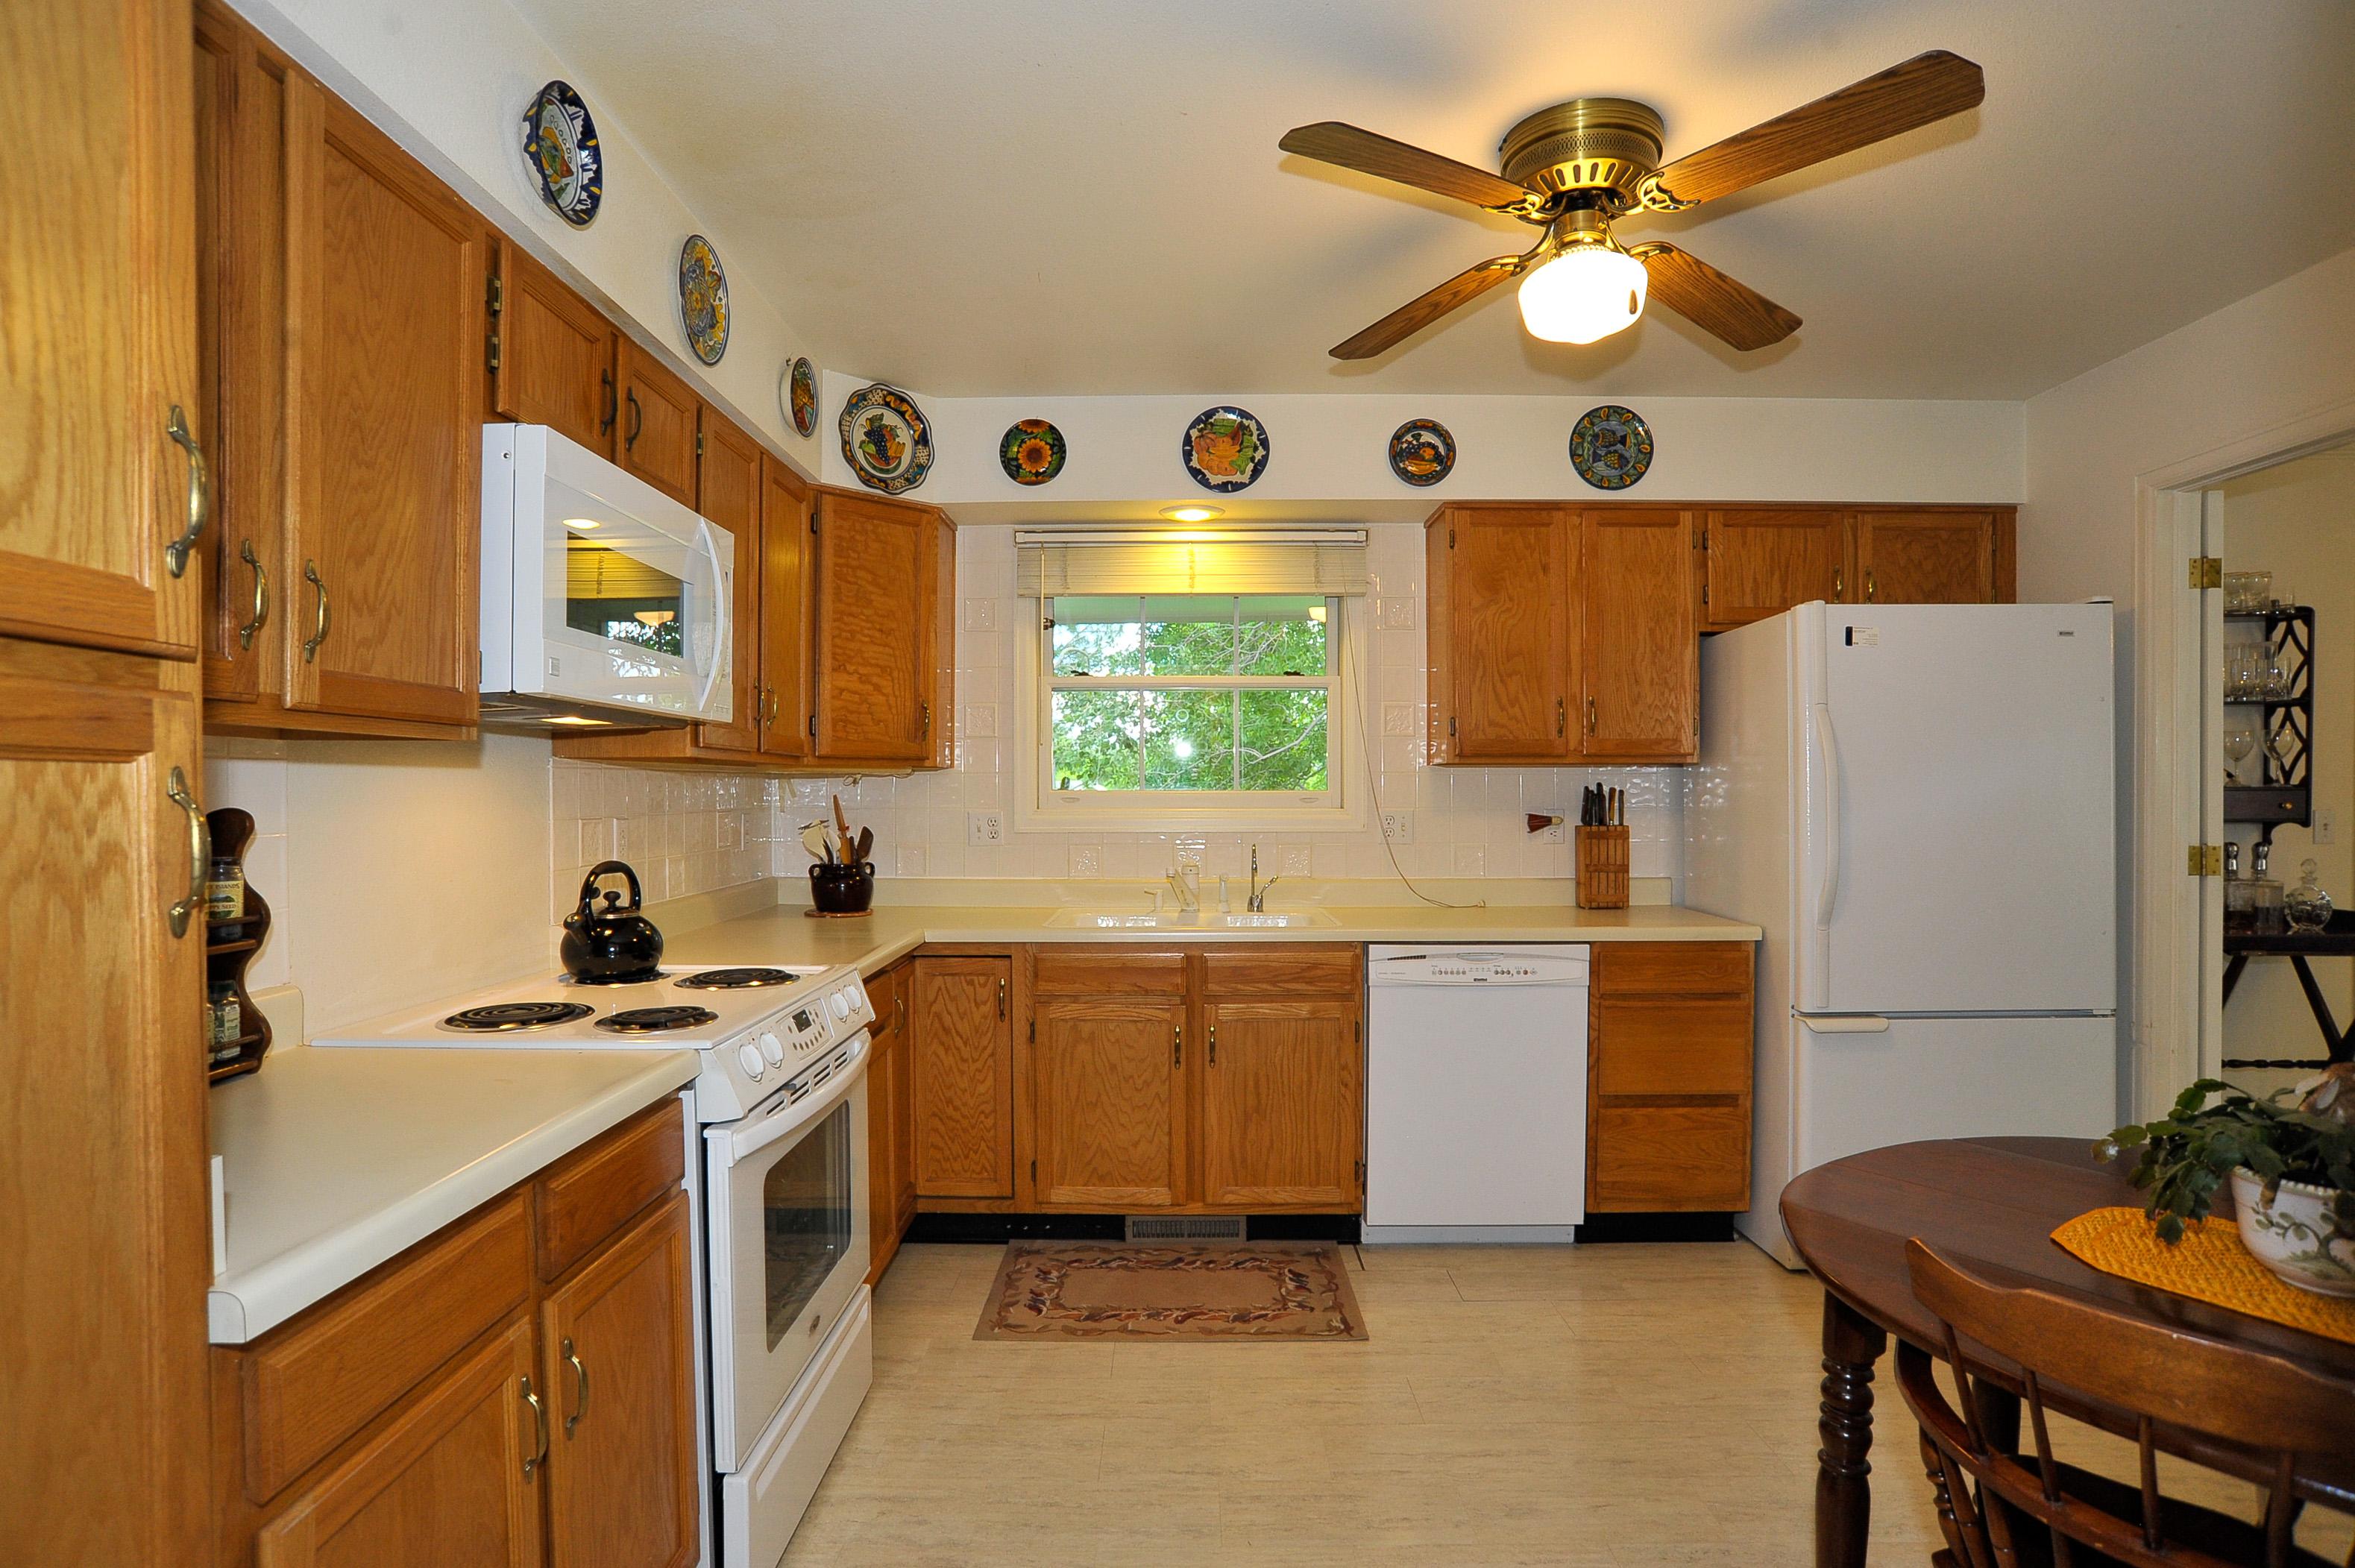 Large Tiled Kitchen with Abundant Cabinetry